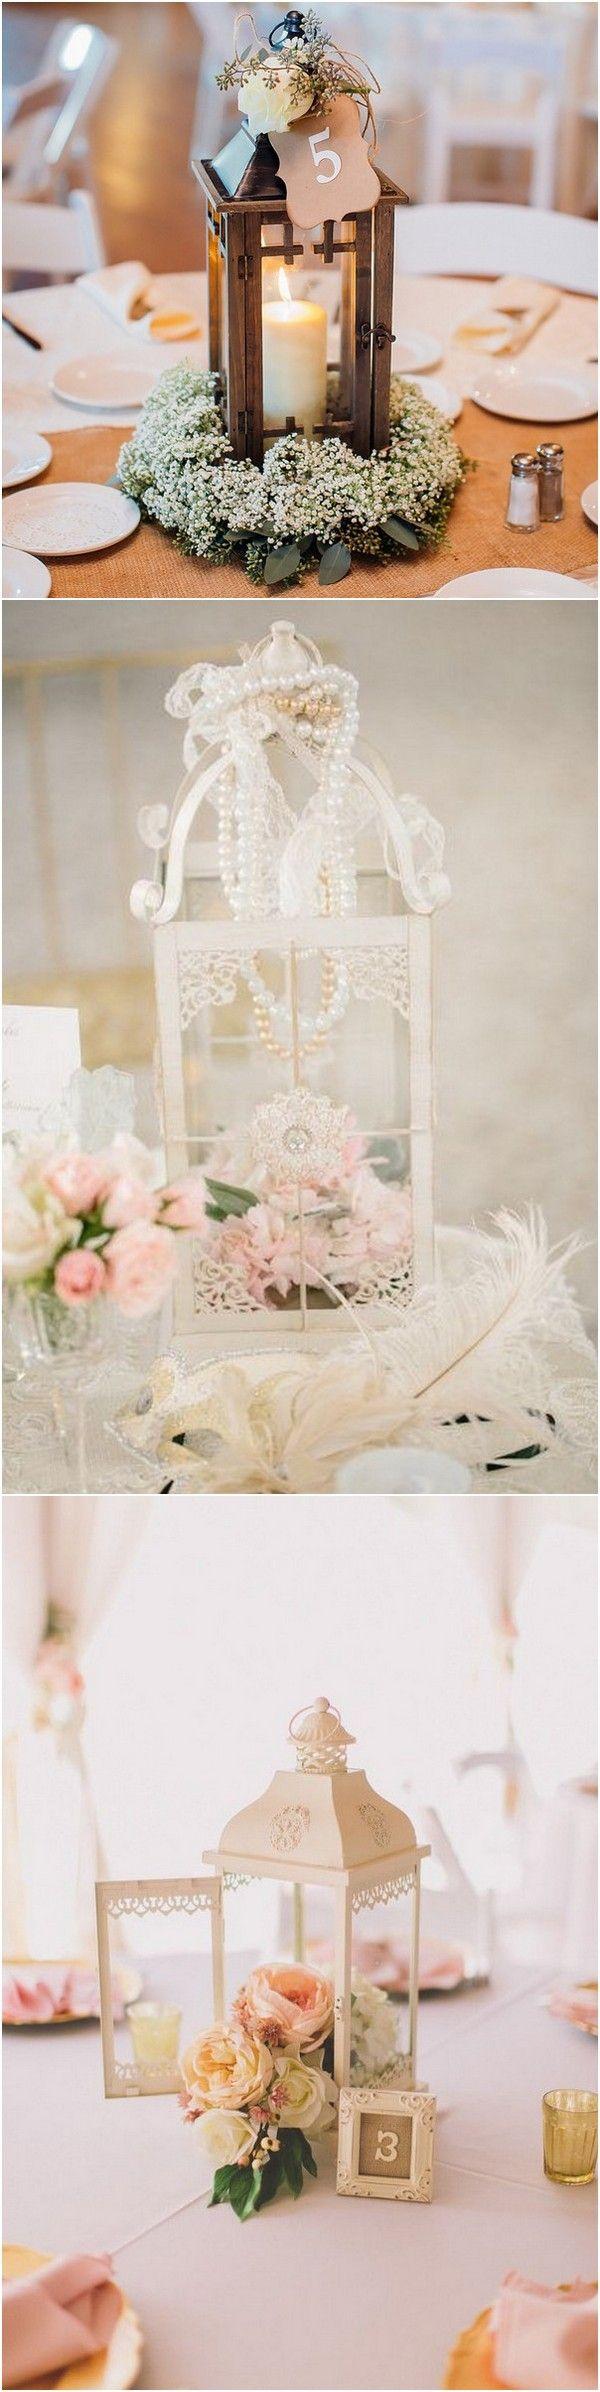 50 Fabulous Vintage Wedding Centerpiece Decoration Ideas - Page 3 of ...